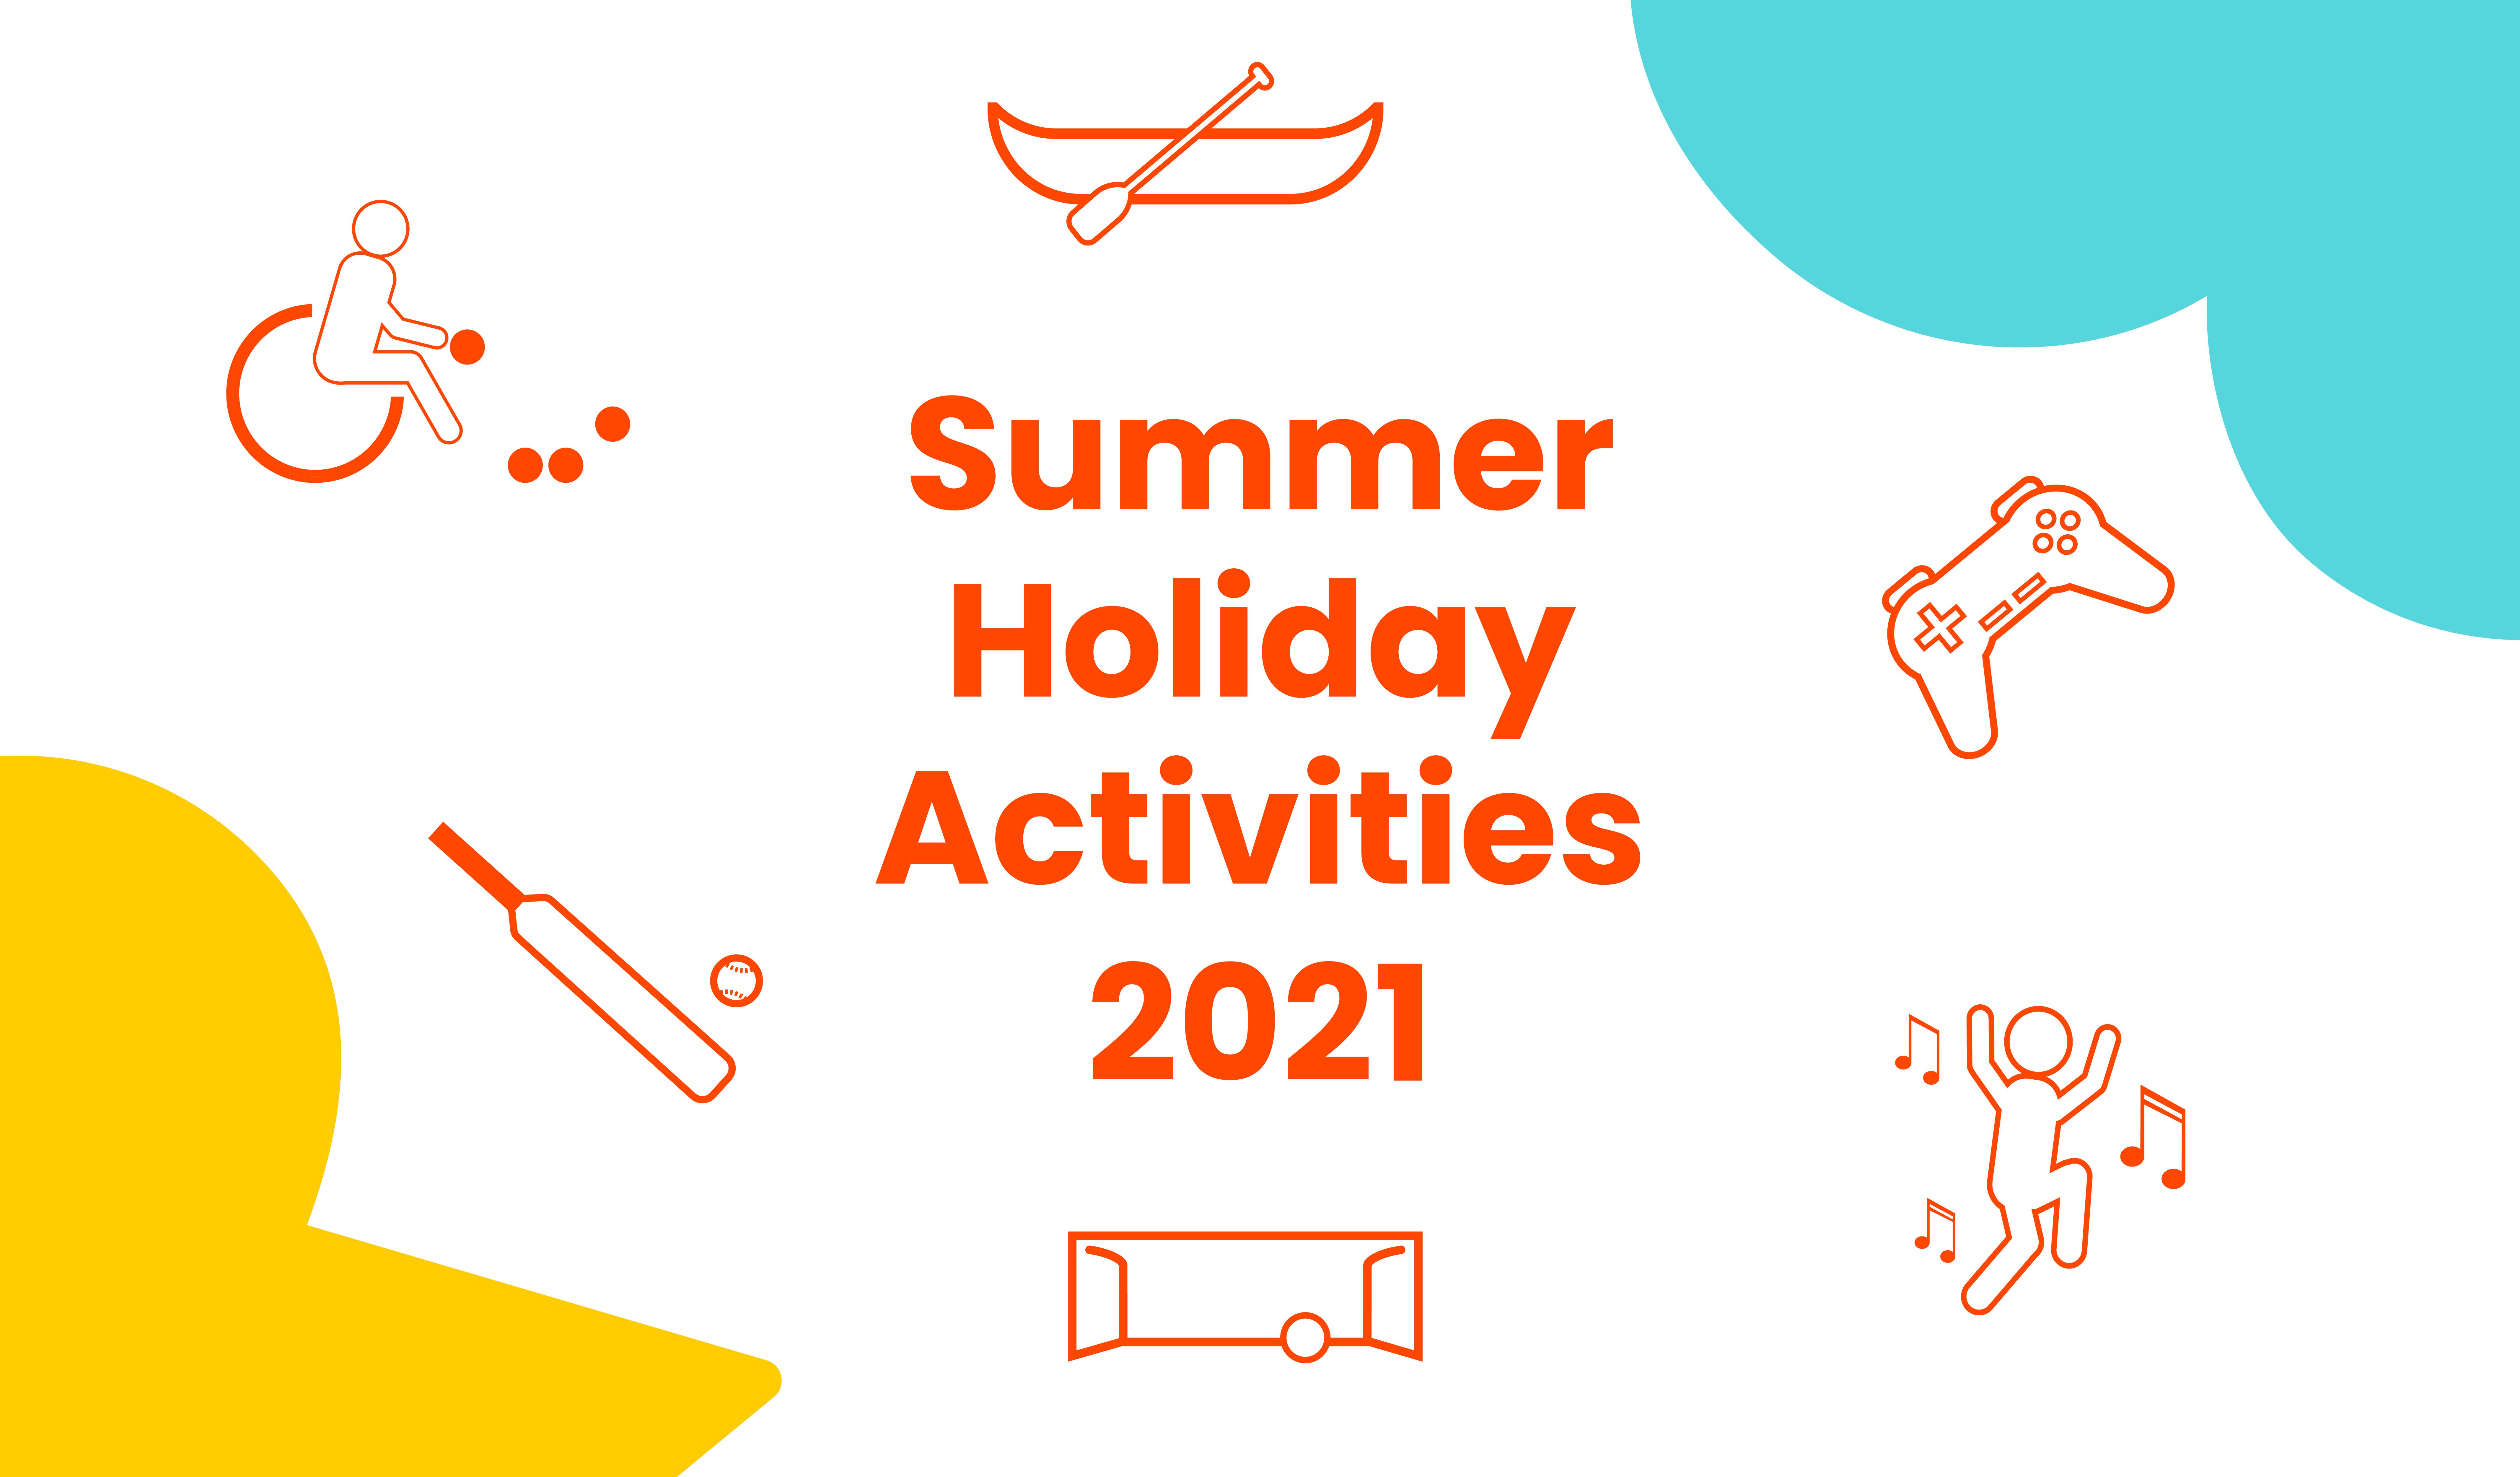 Summer Holiday Activities 2021